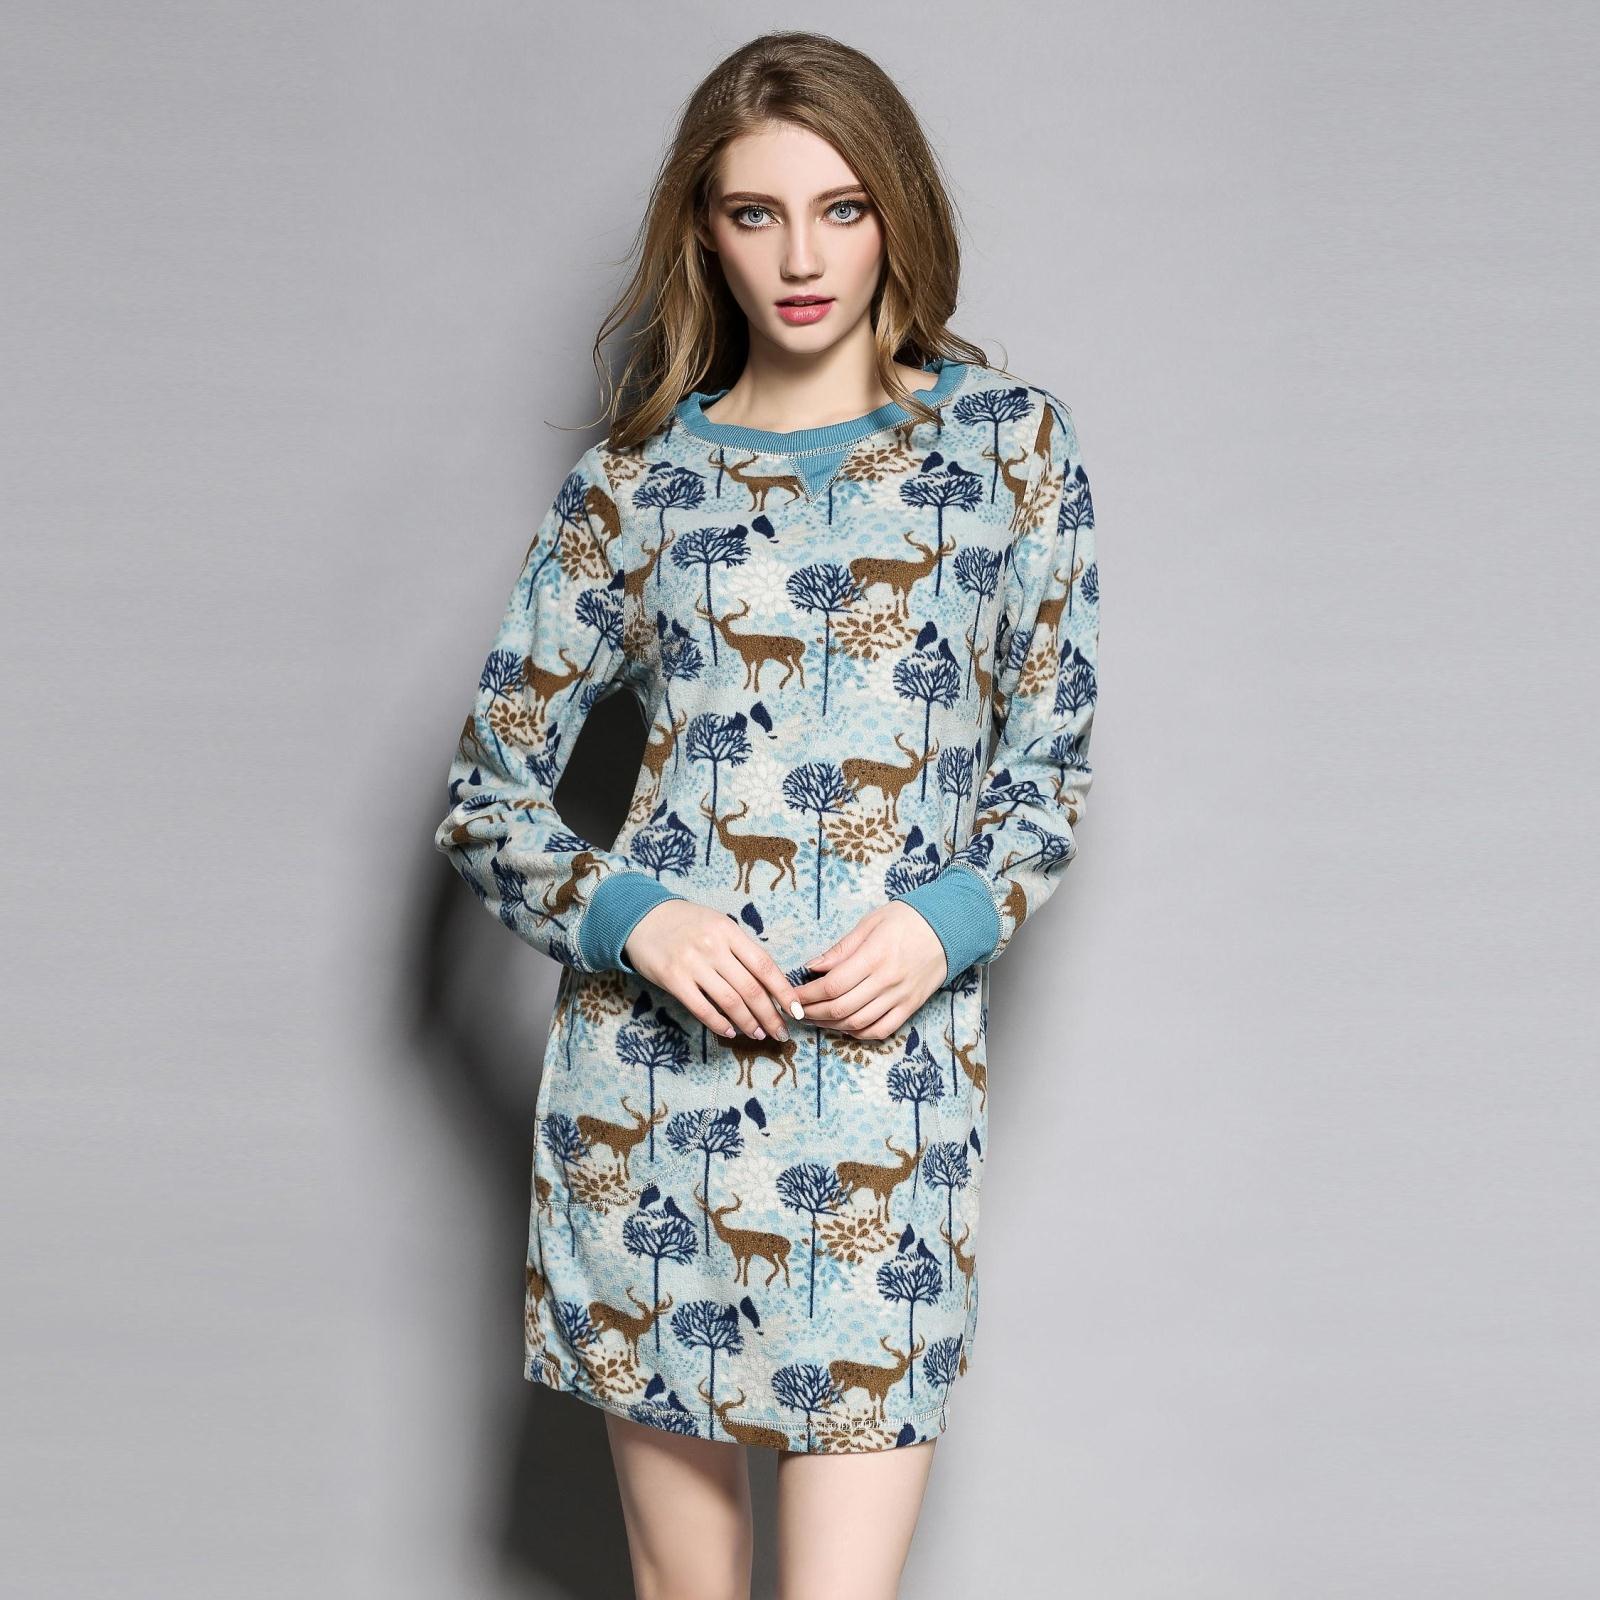 Nightgowns Women Soft Thermal Polar Fleece Fabric Long-sleeve Nightgown Short Robe Nightdress Womens Night RobeОдежда и ак�е��уары<br><br><br>Aliexpress